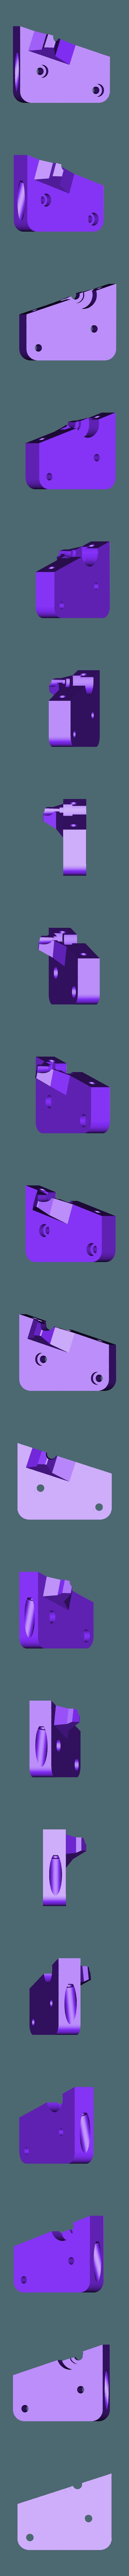 Dual_E3D_Mount_v4-4_EDGE_CLAMP.STL Download free STL file Jellyfish Mount (RigidBot Dual E3Dv6) • 3D printer object, WalterHsiao